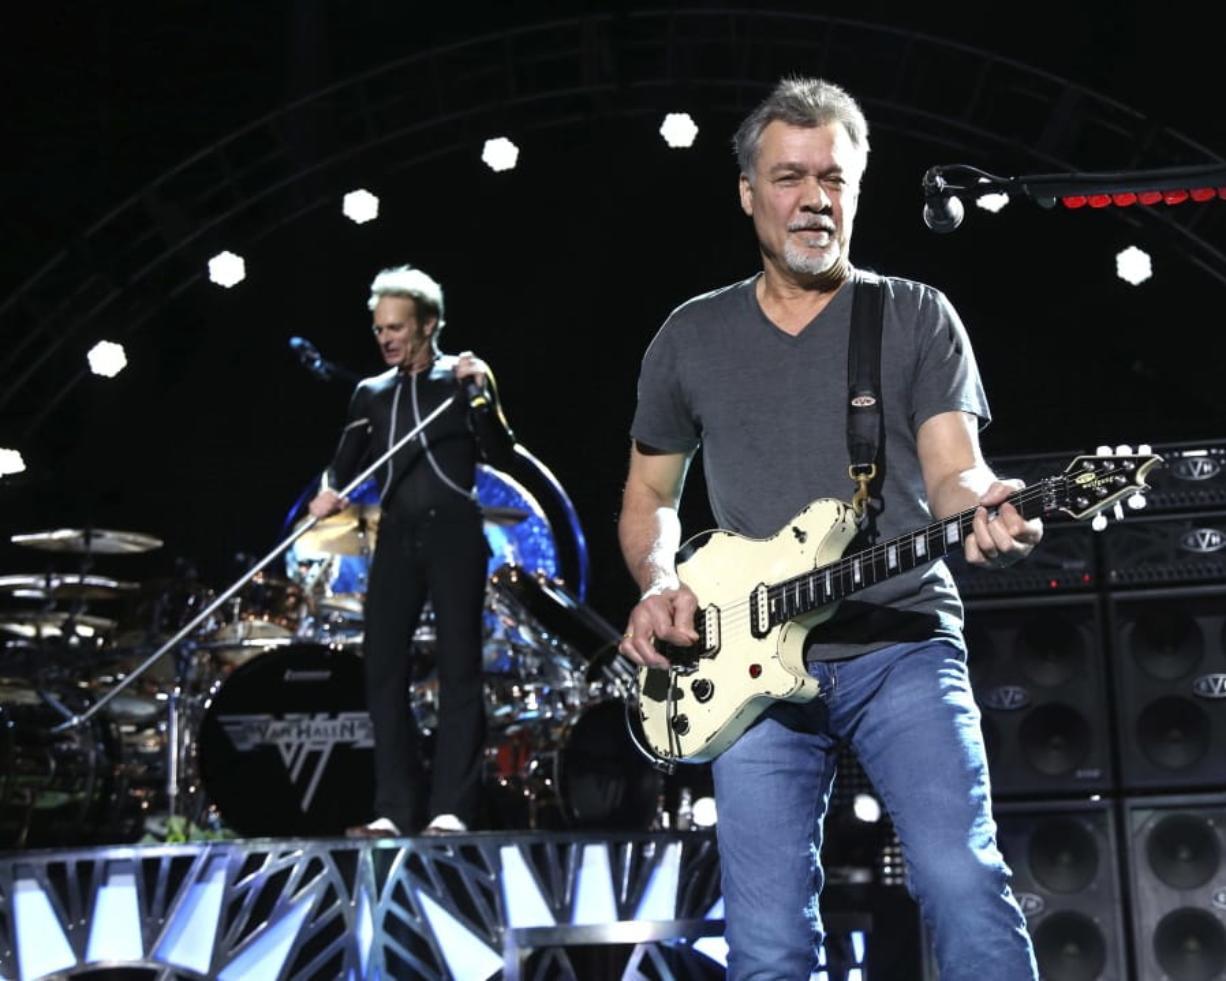 FILE - David Lee Roth, left, and Eddie Van Halen of Van Halen perform on Aug. 13, 2015, in Wantagh, N.Y. Van Halen, who had battled cancer, died Tuesday, Oct. 6, 2020. He was 65.